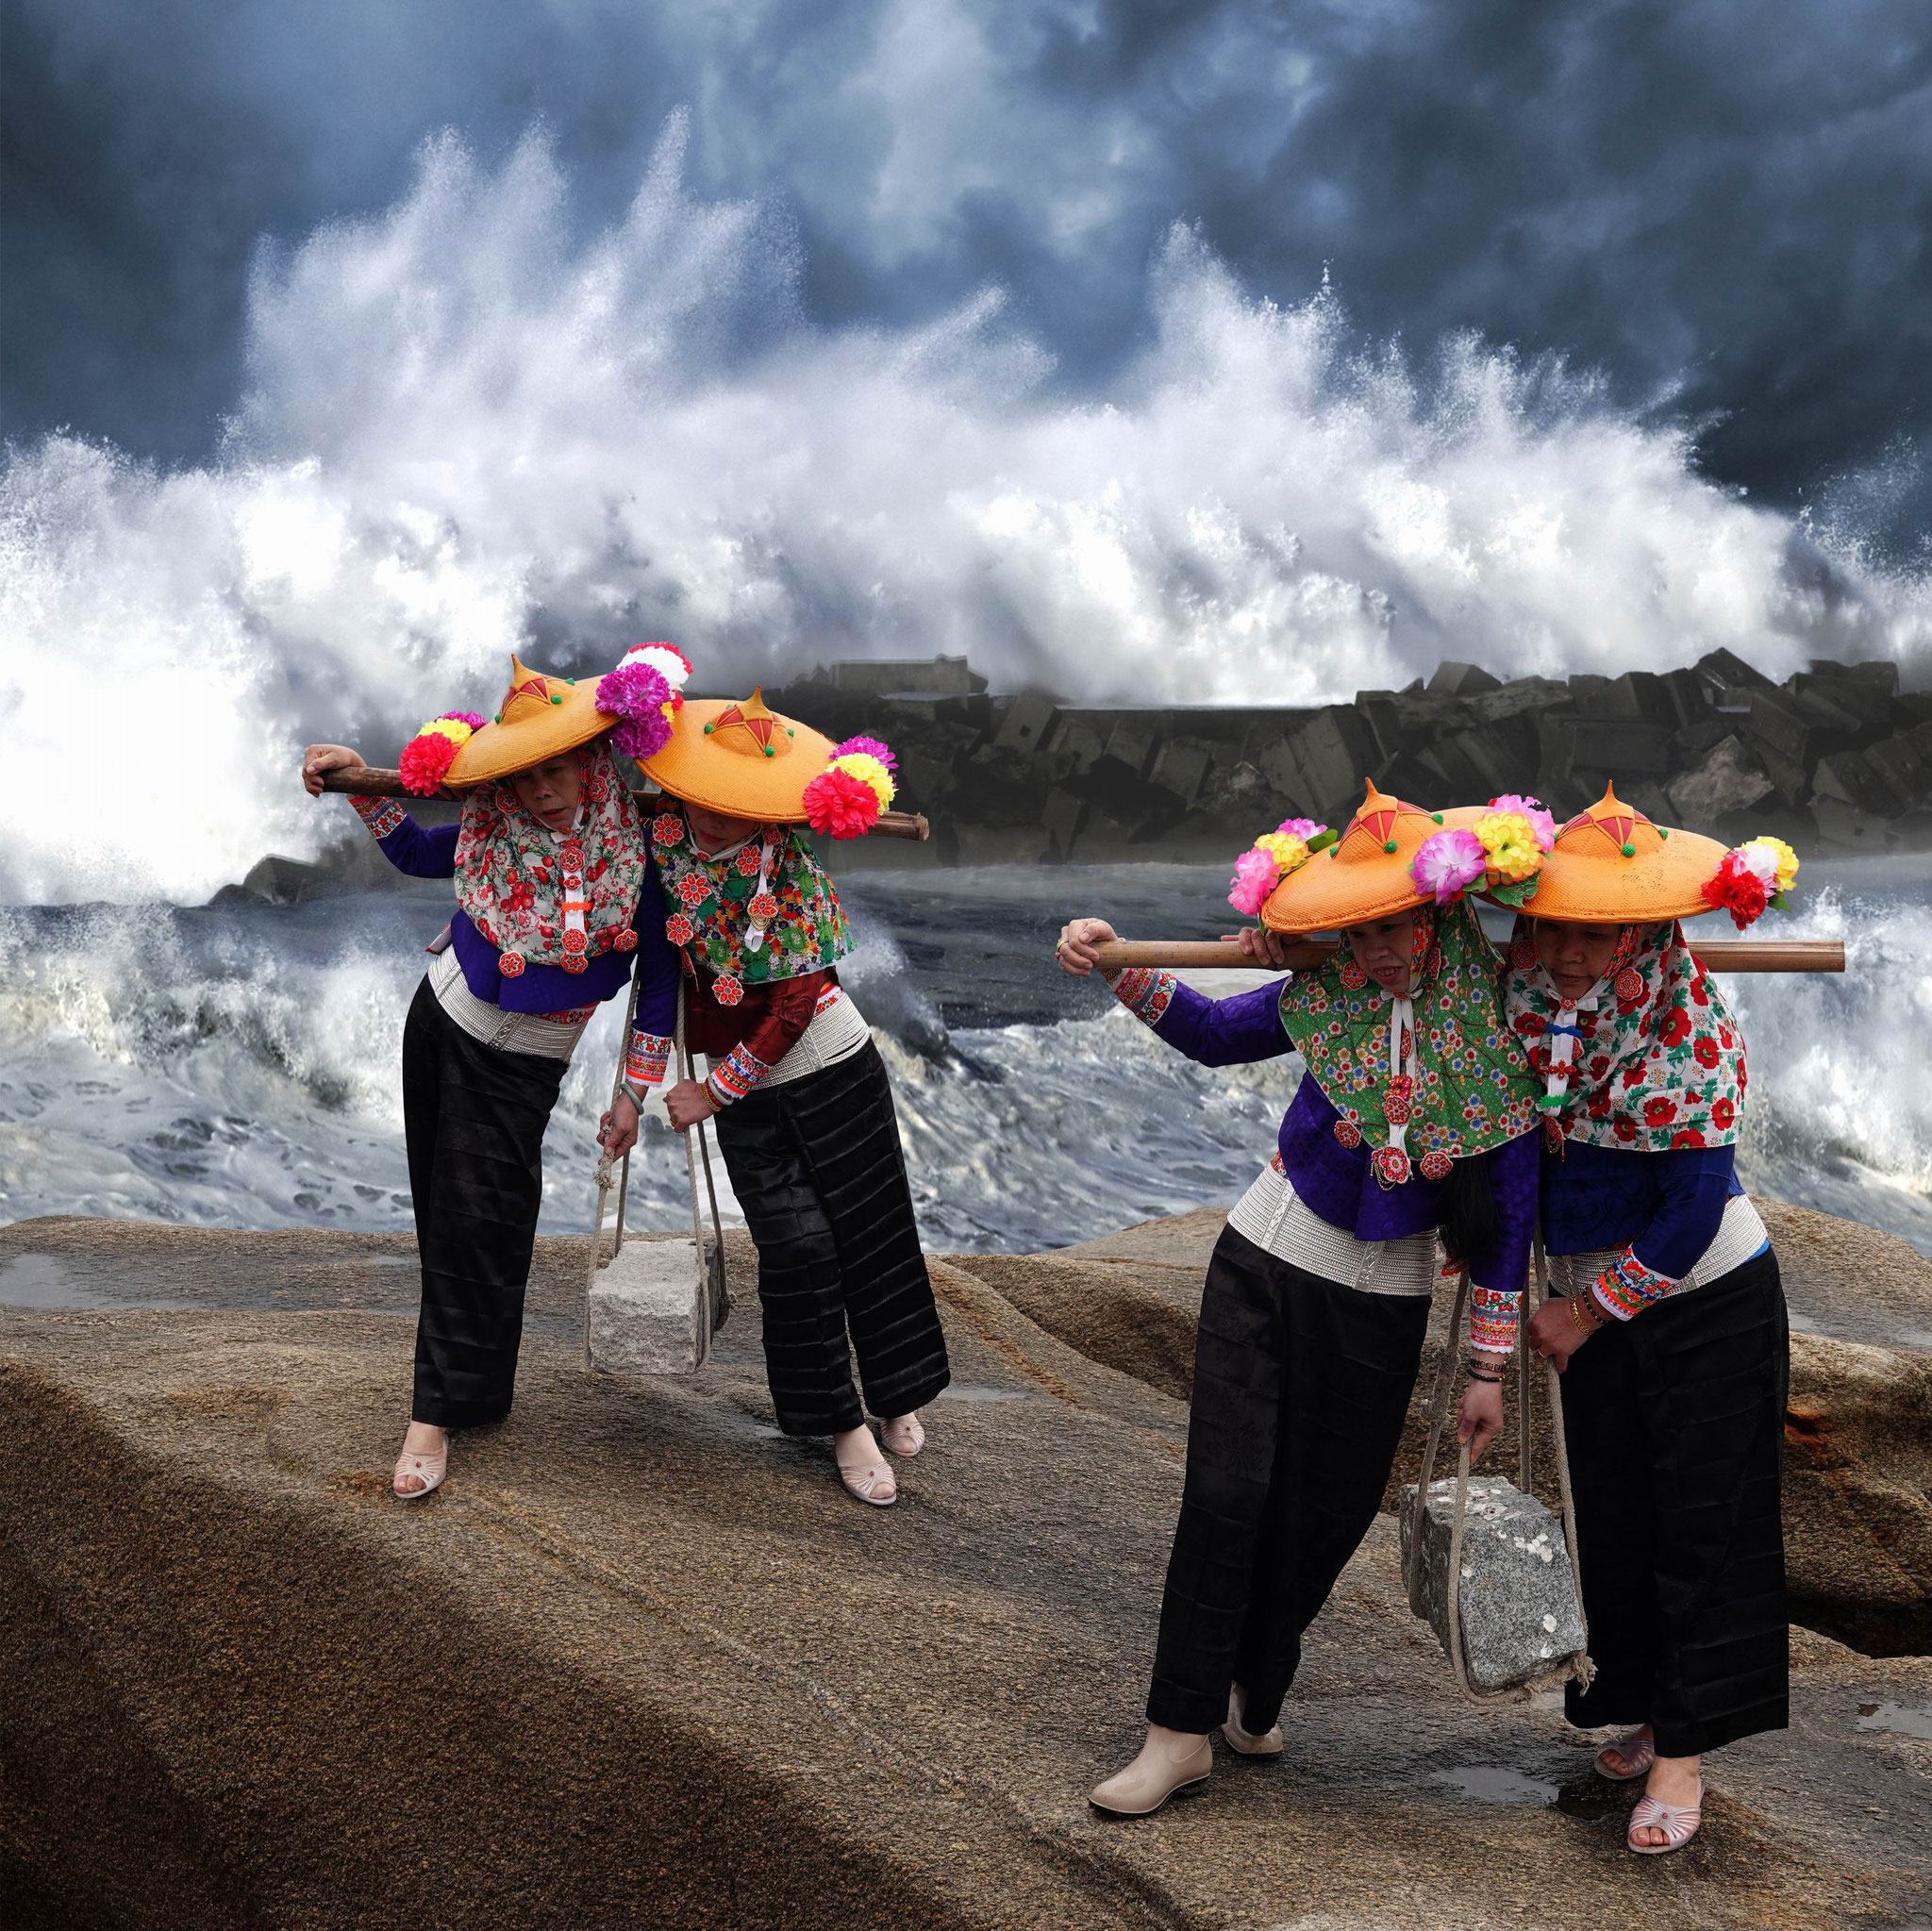 SHE Jiahu (China) -Tempestuous waves